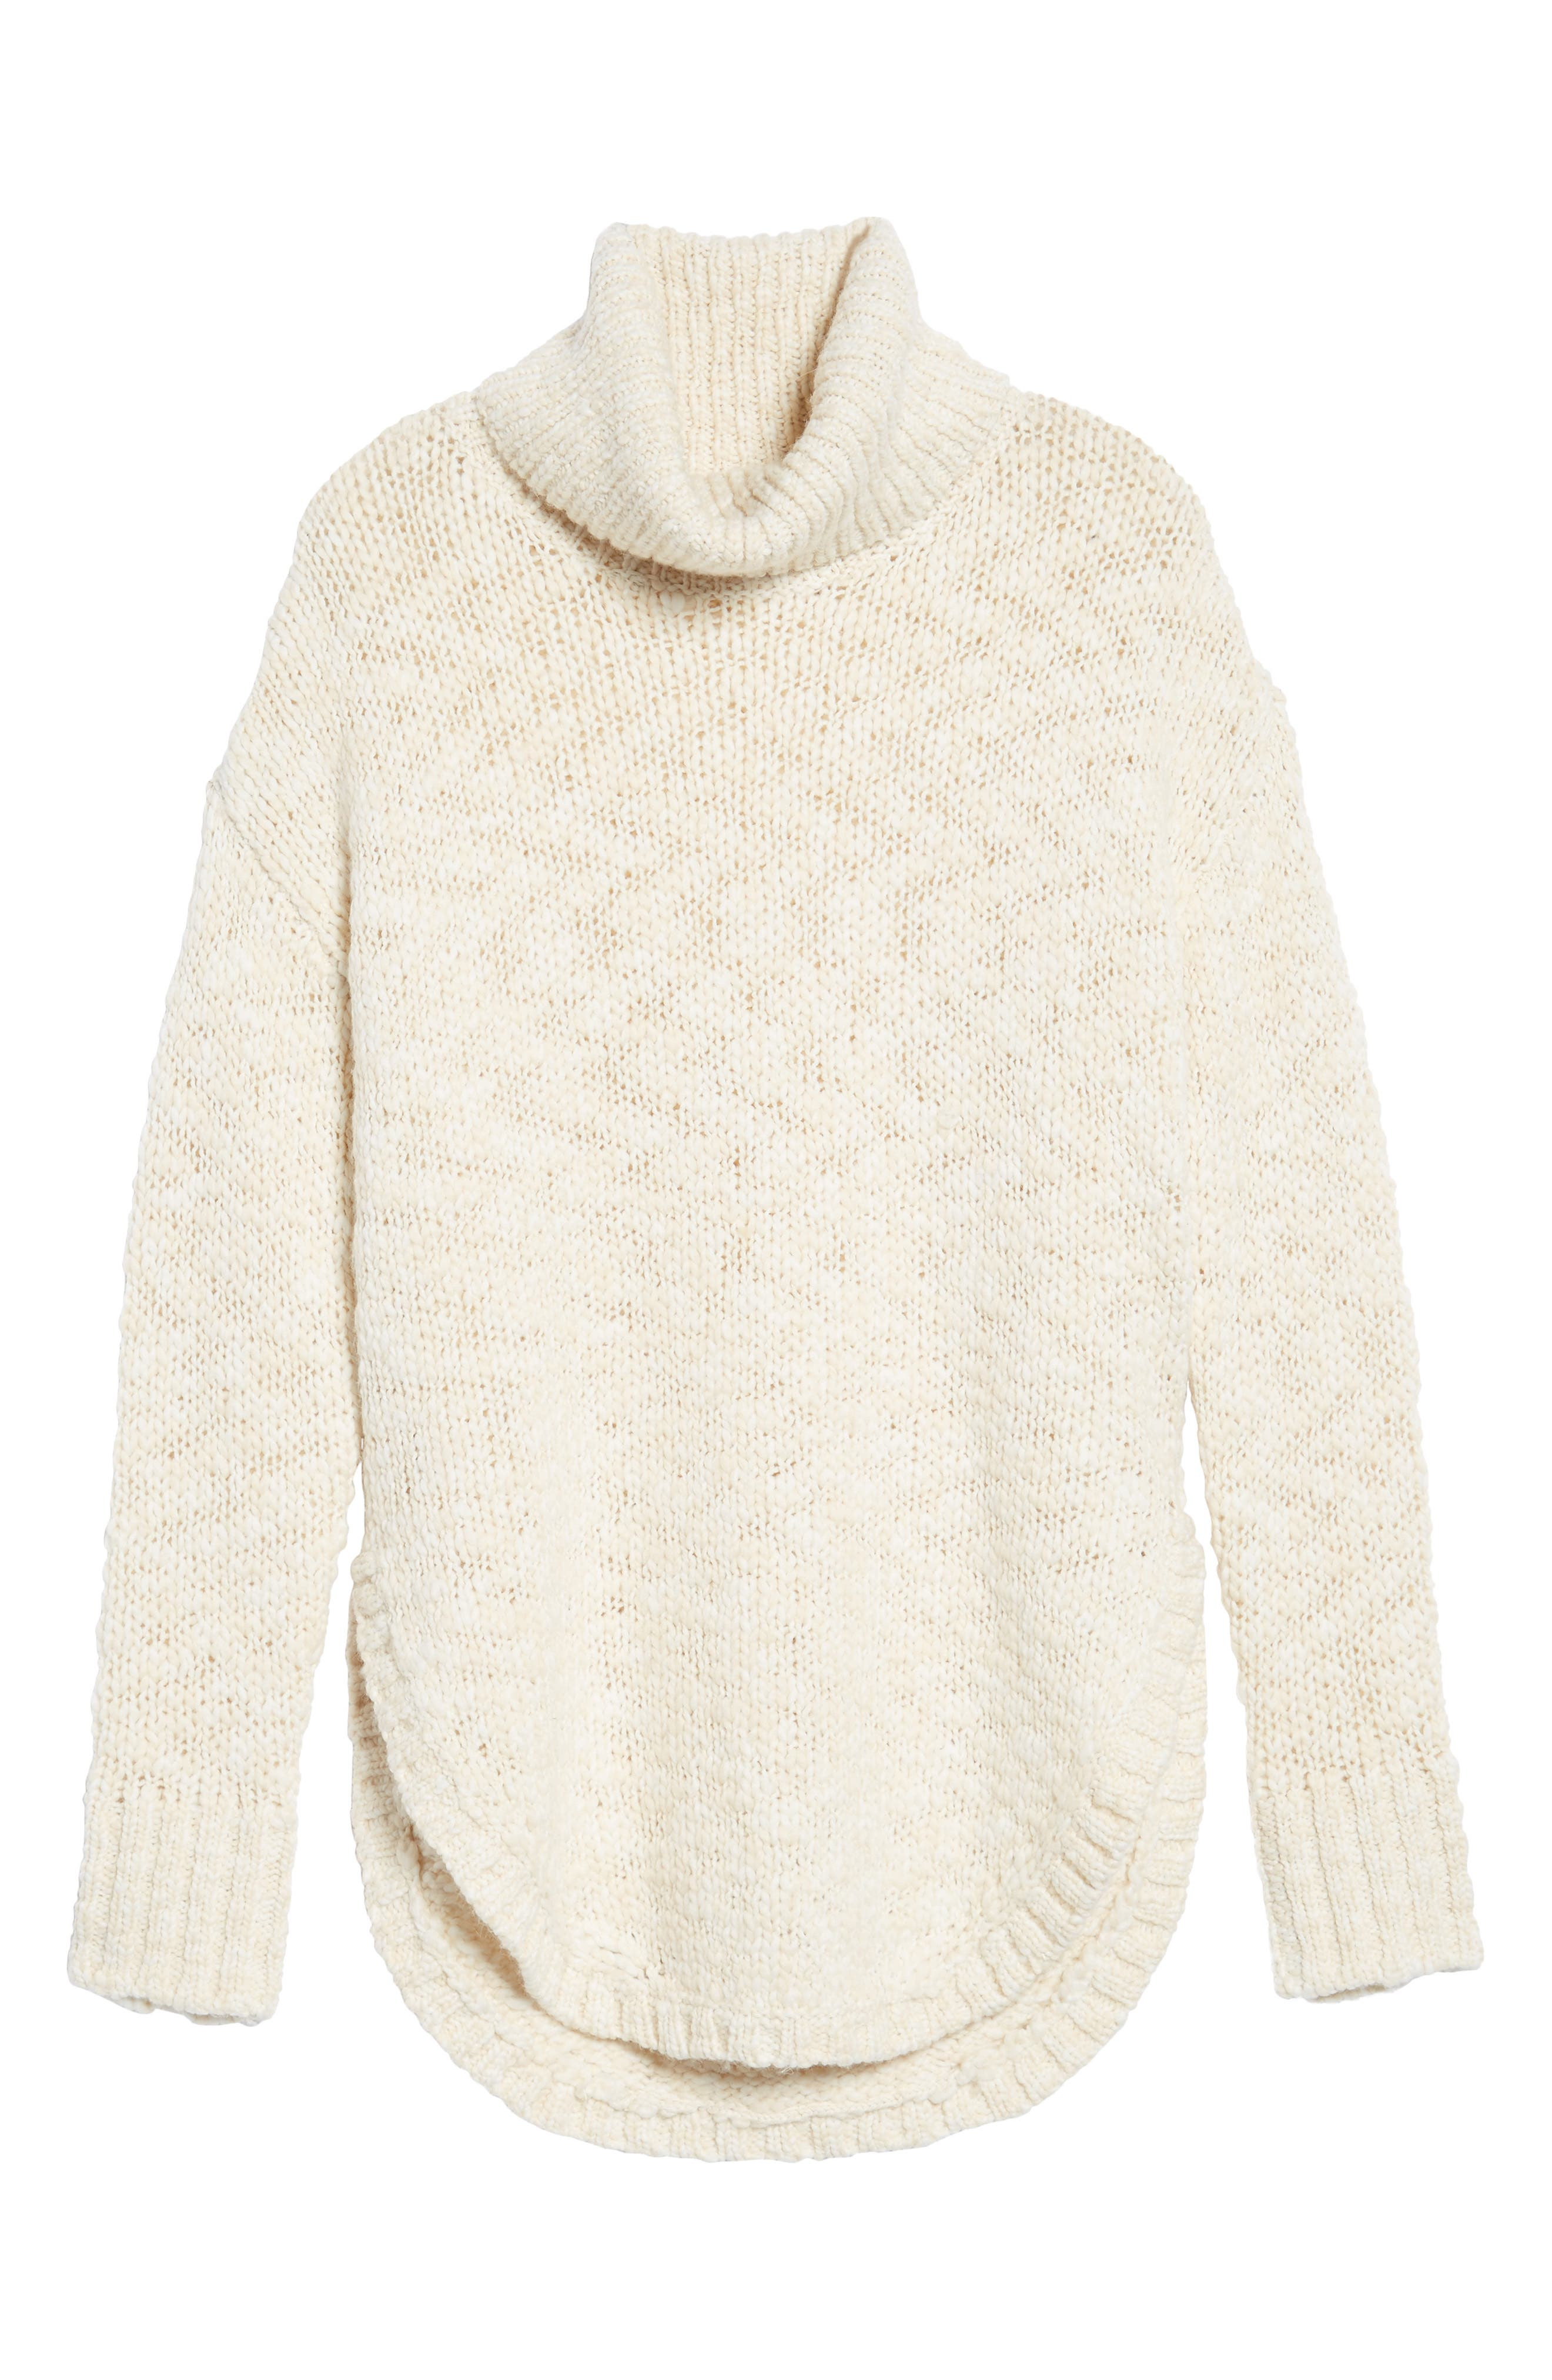 Treasure&Bond Turtleneck Sweater,                             Alternate thumbnail 6, color,                             BEIGE BEACH COMBO